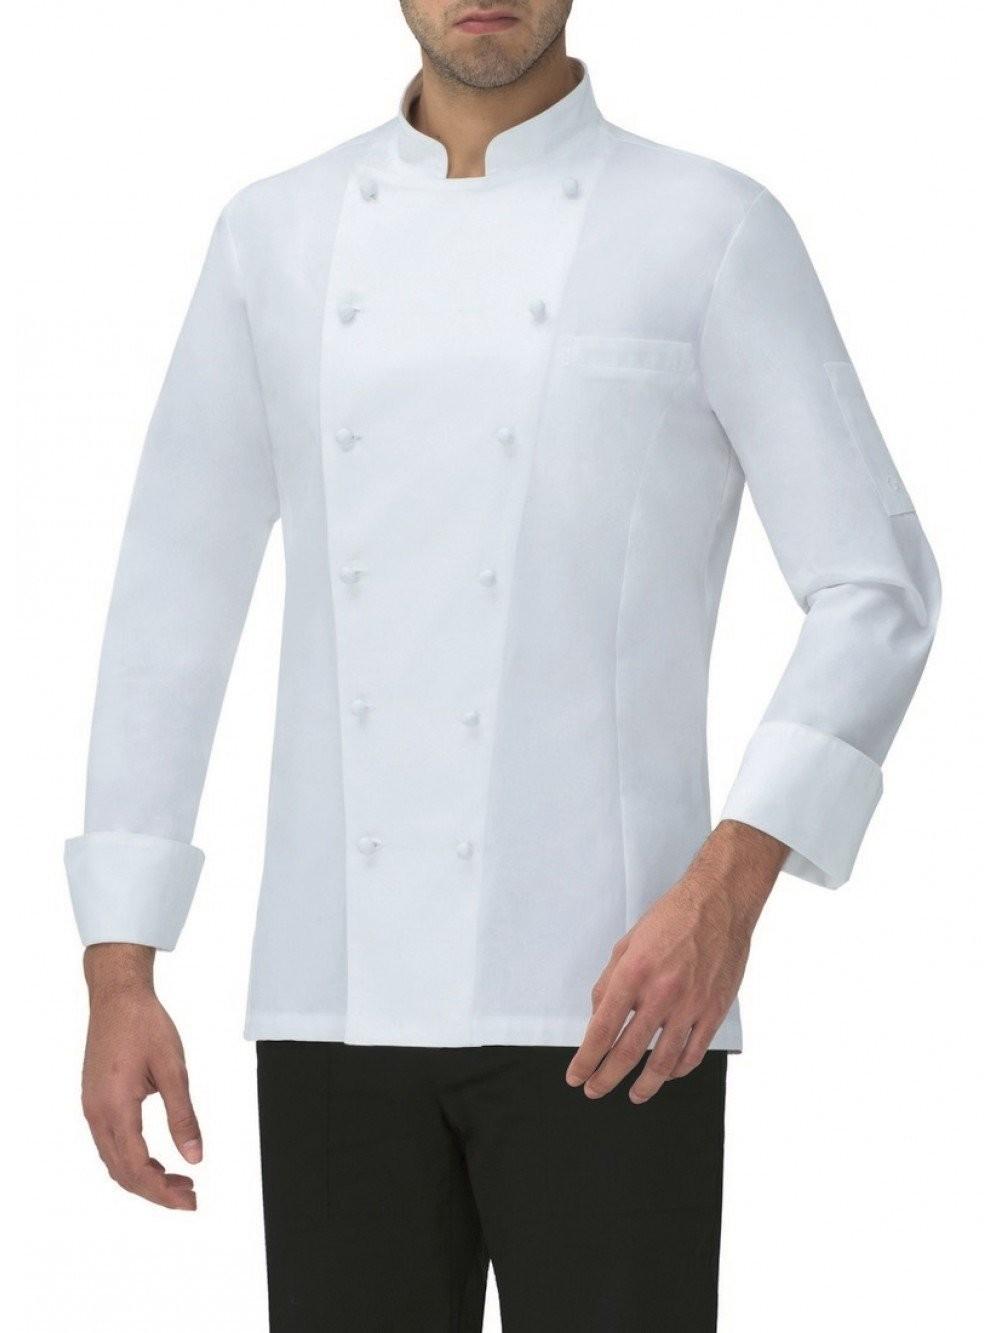 Giacca Cuoco Executive Chef Giblor S Bianca